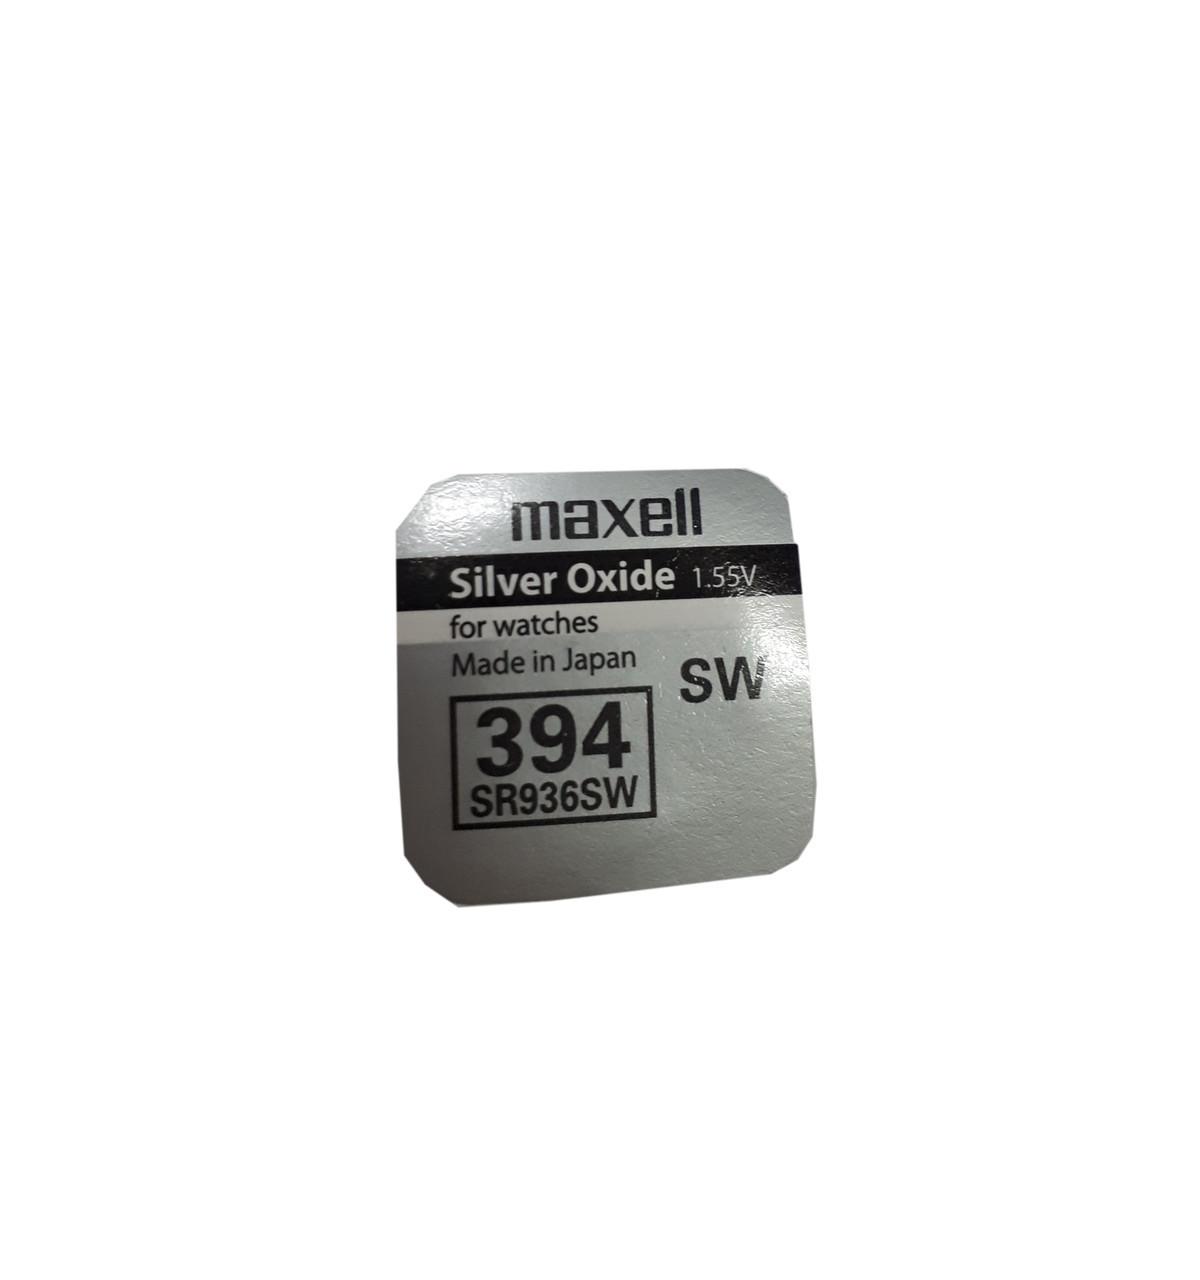 Часовая батарейка Maxell SR 936 SW G9 (394)опт